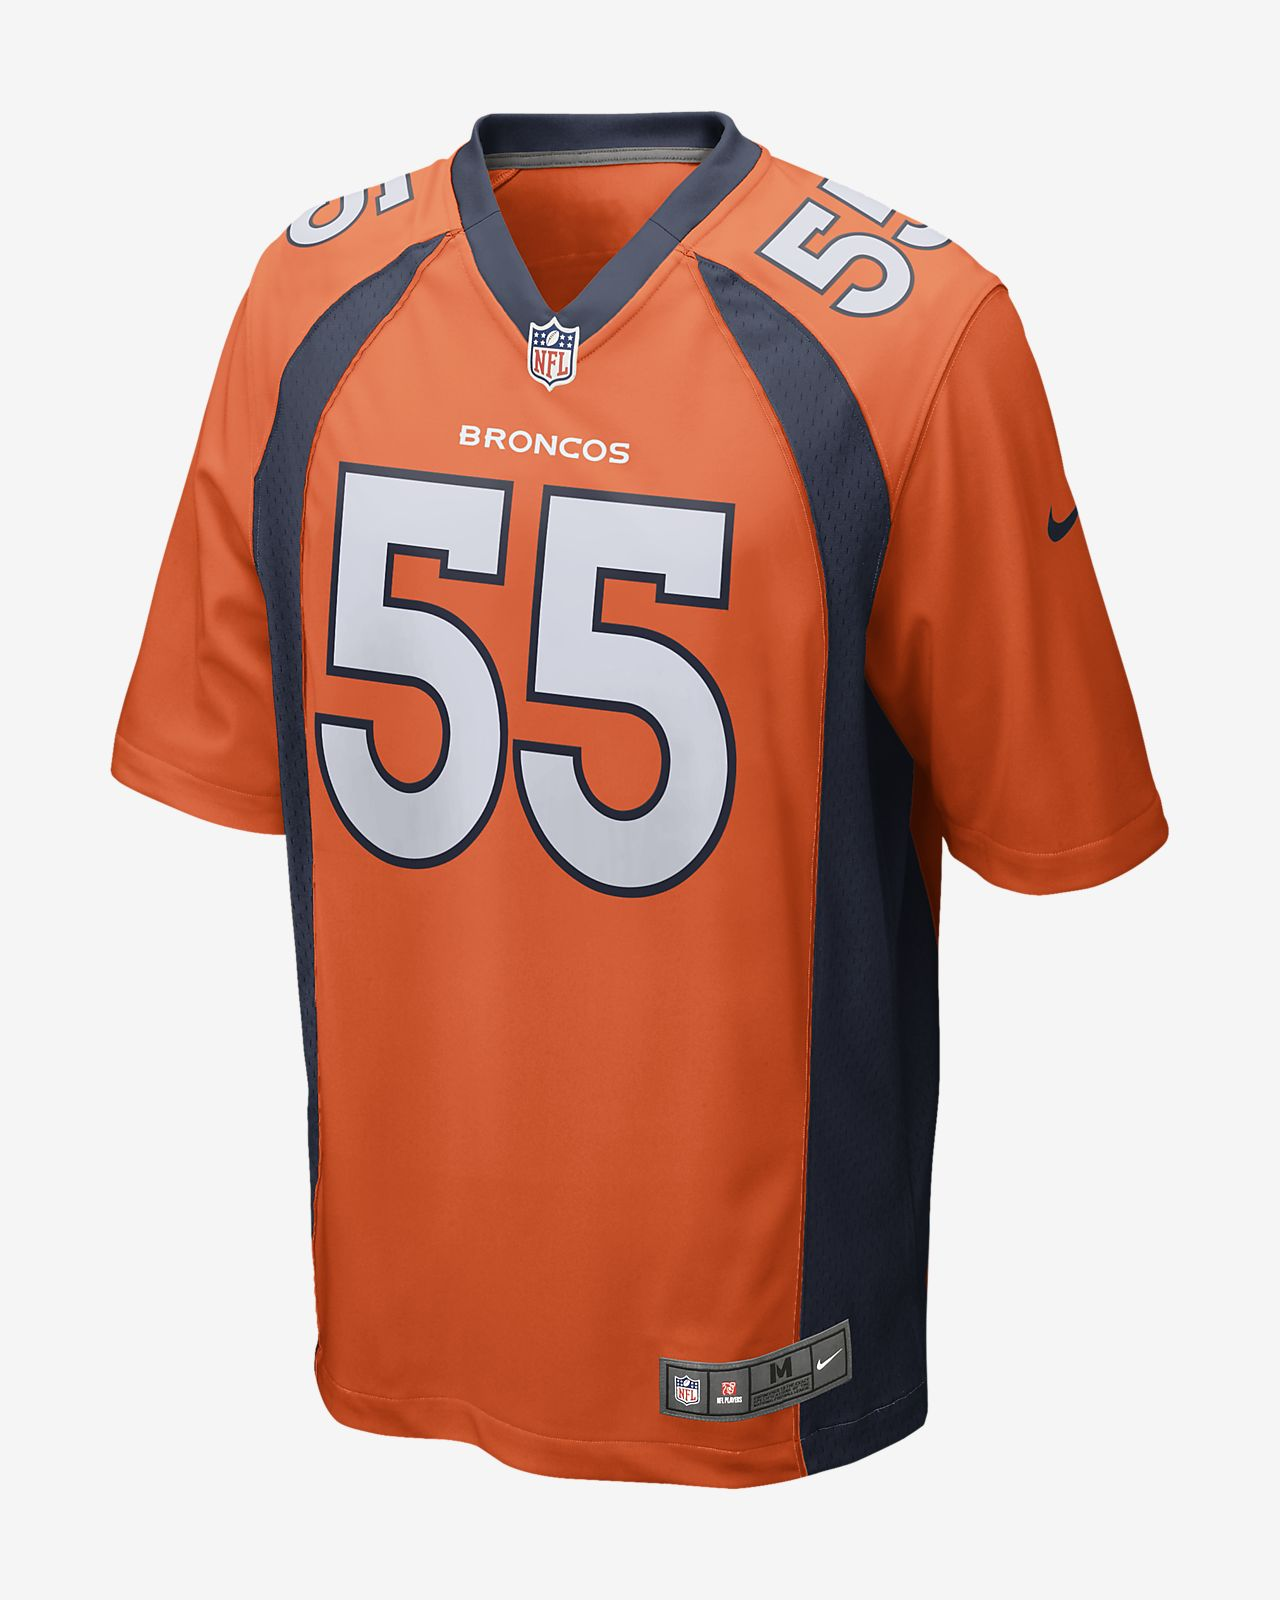 e5b48943 NFL Denver Broncos Game (Bradley Chubb) Men's Football Jersey